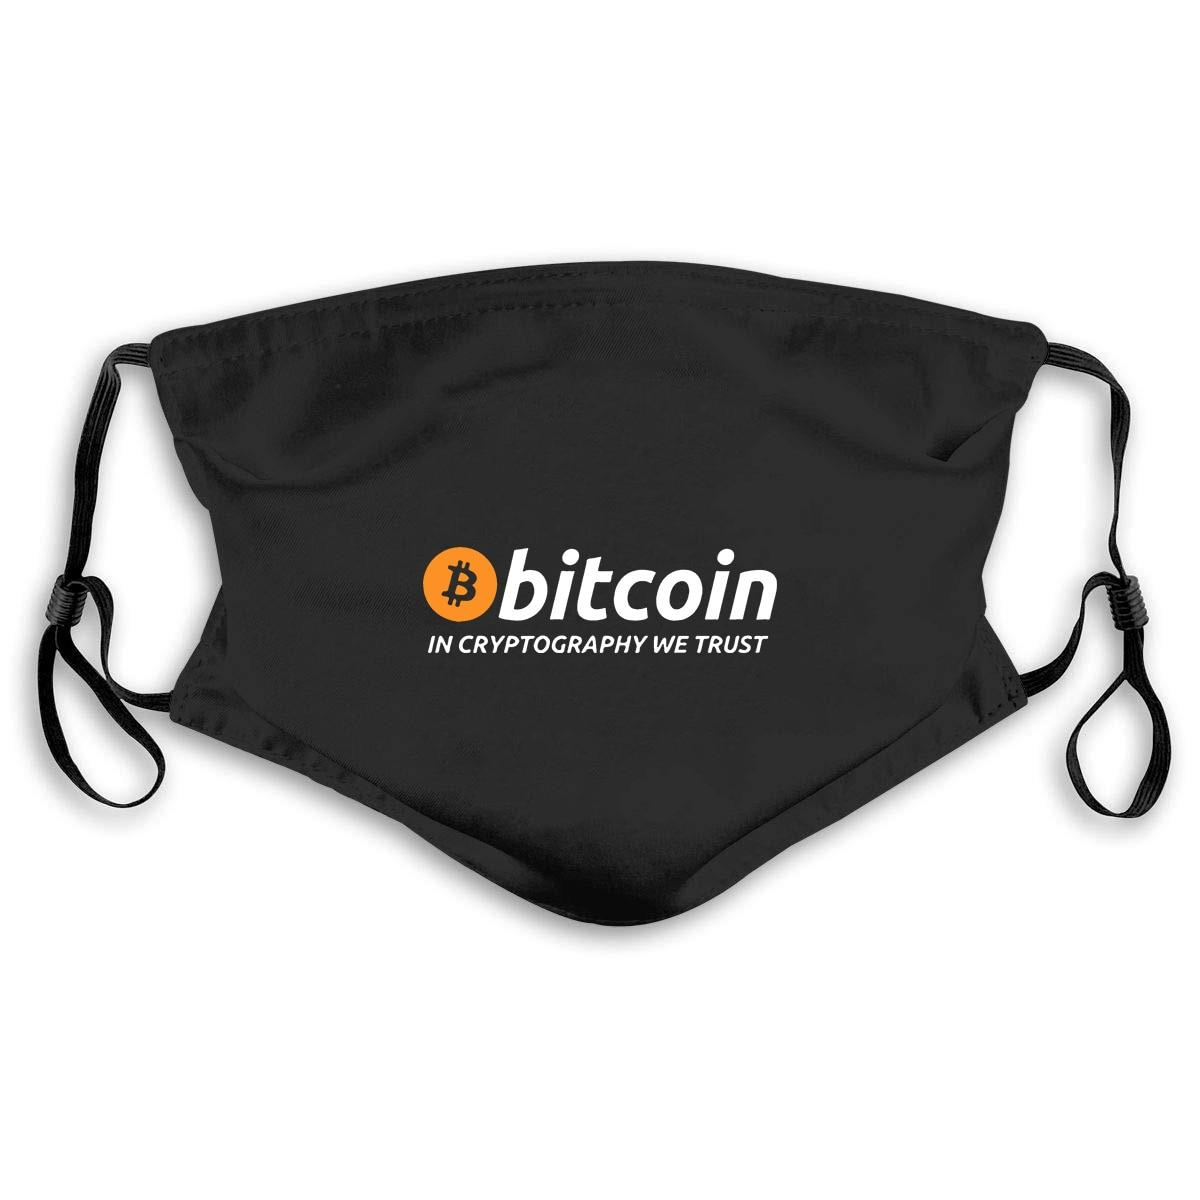 2020 T Camisas Bitcoin En Criptograf Acu Confiar En Los Hombres De Cuello Oluna De Mask 2020 Masque De Marque De Haute Qualité C